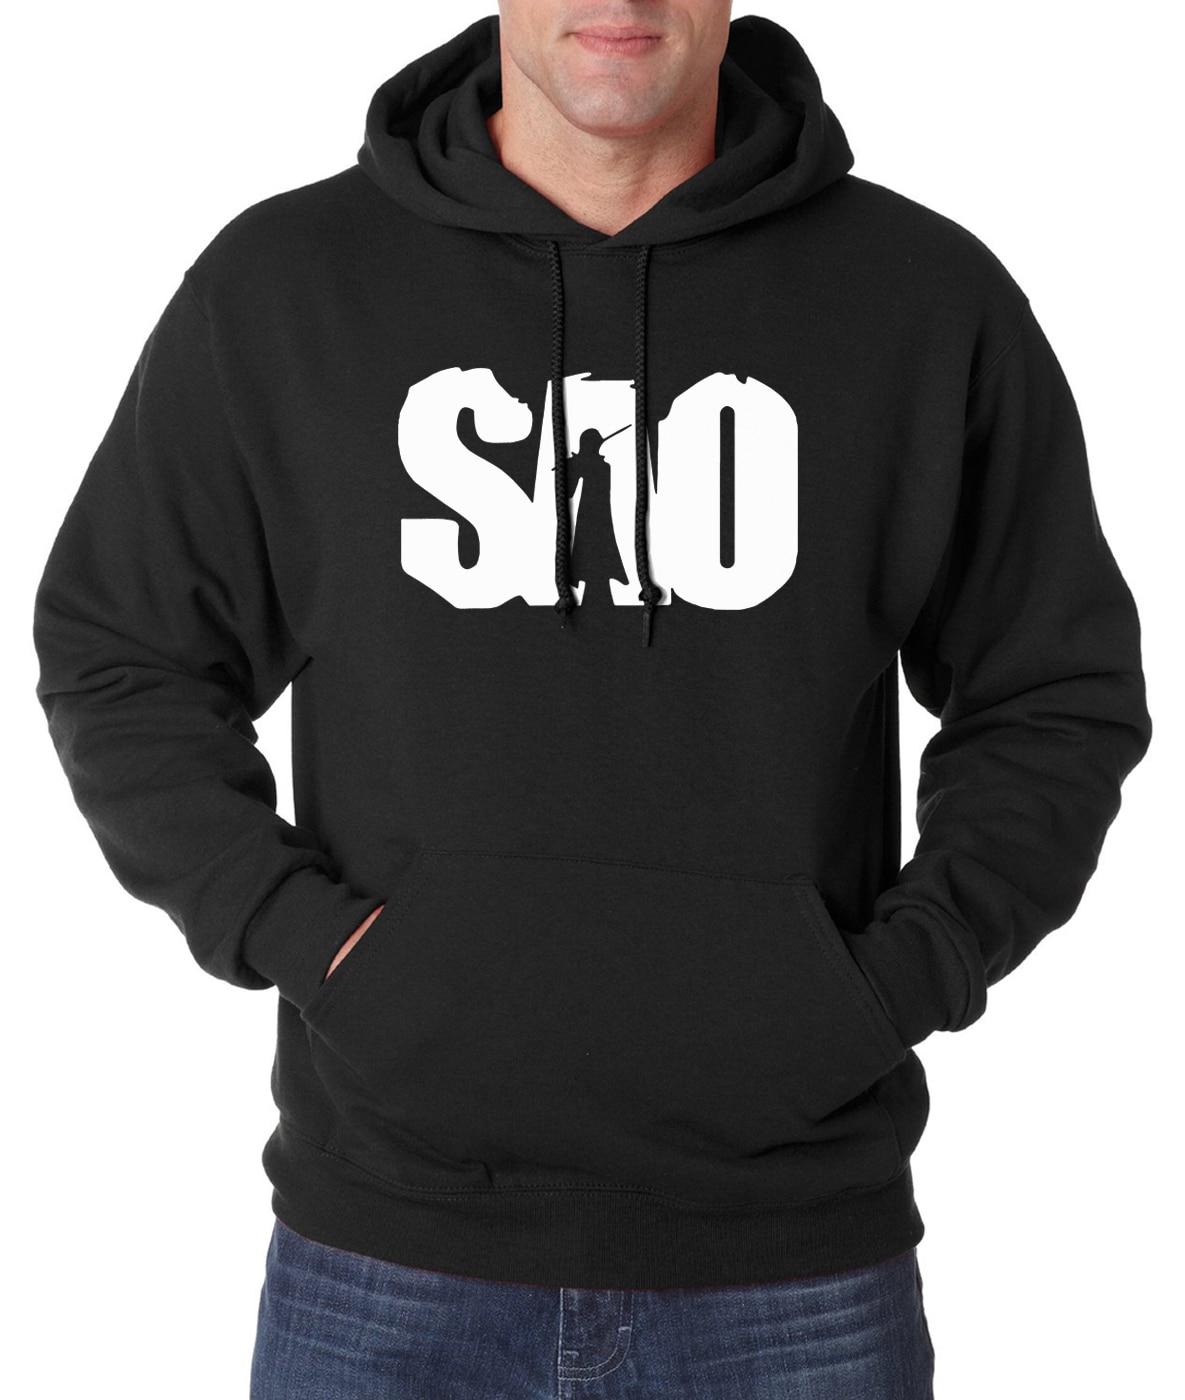 hot sale Anime S.A.O sweatshirts men 2019 spring winter new Sword Art Online hoodies men fleece fashion harajuku men hoodie